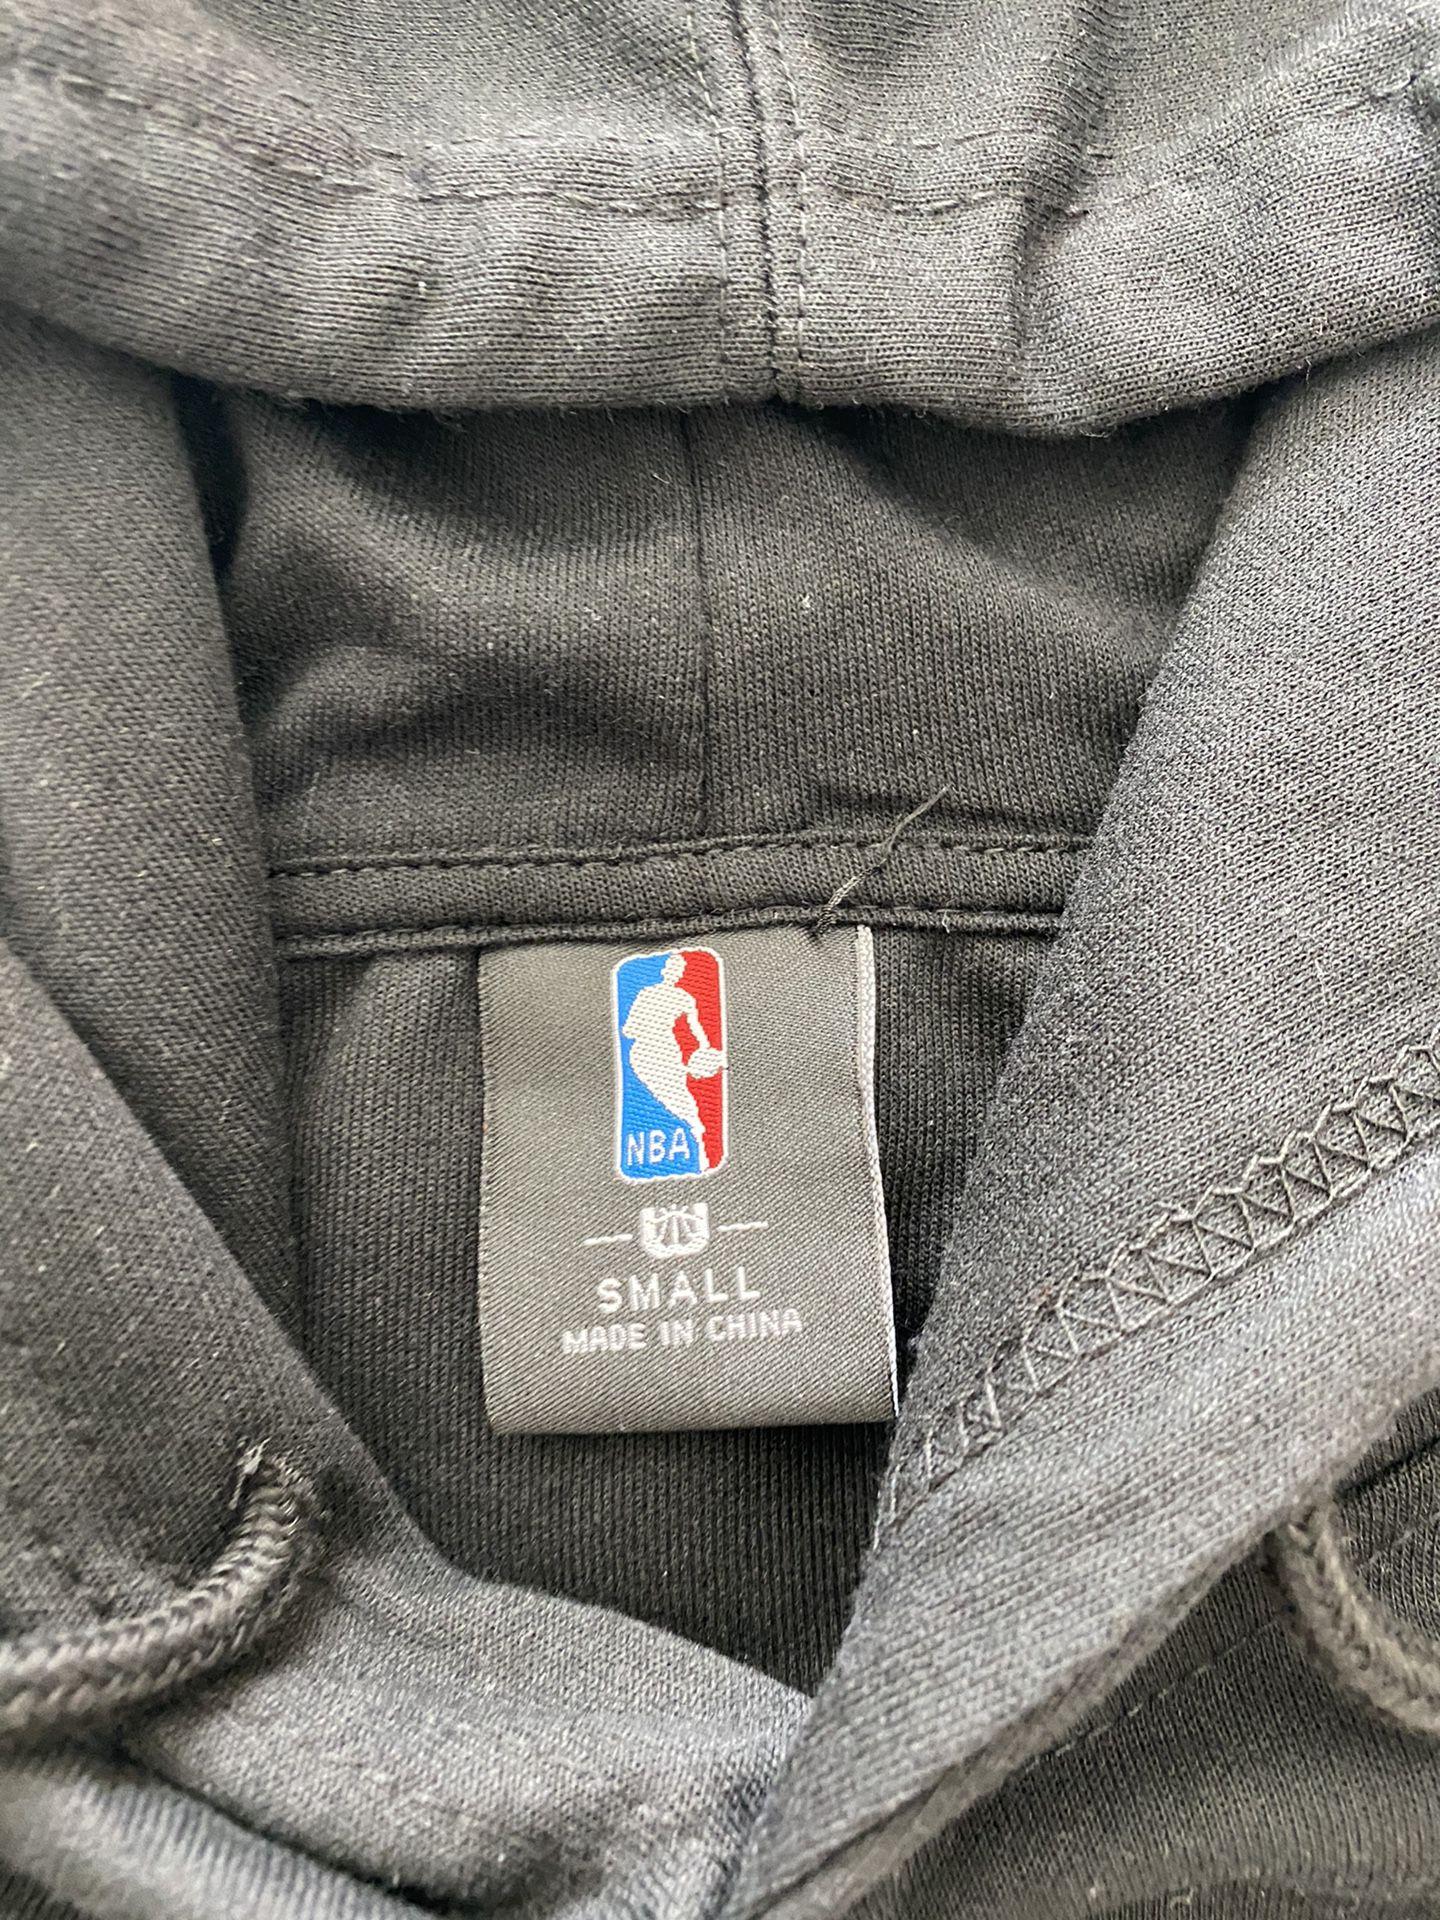 Los Angeles Lakers NBA Men's Hoodie Sweater Black Purple Size Small